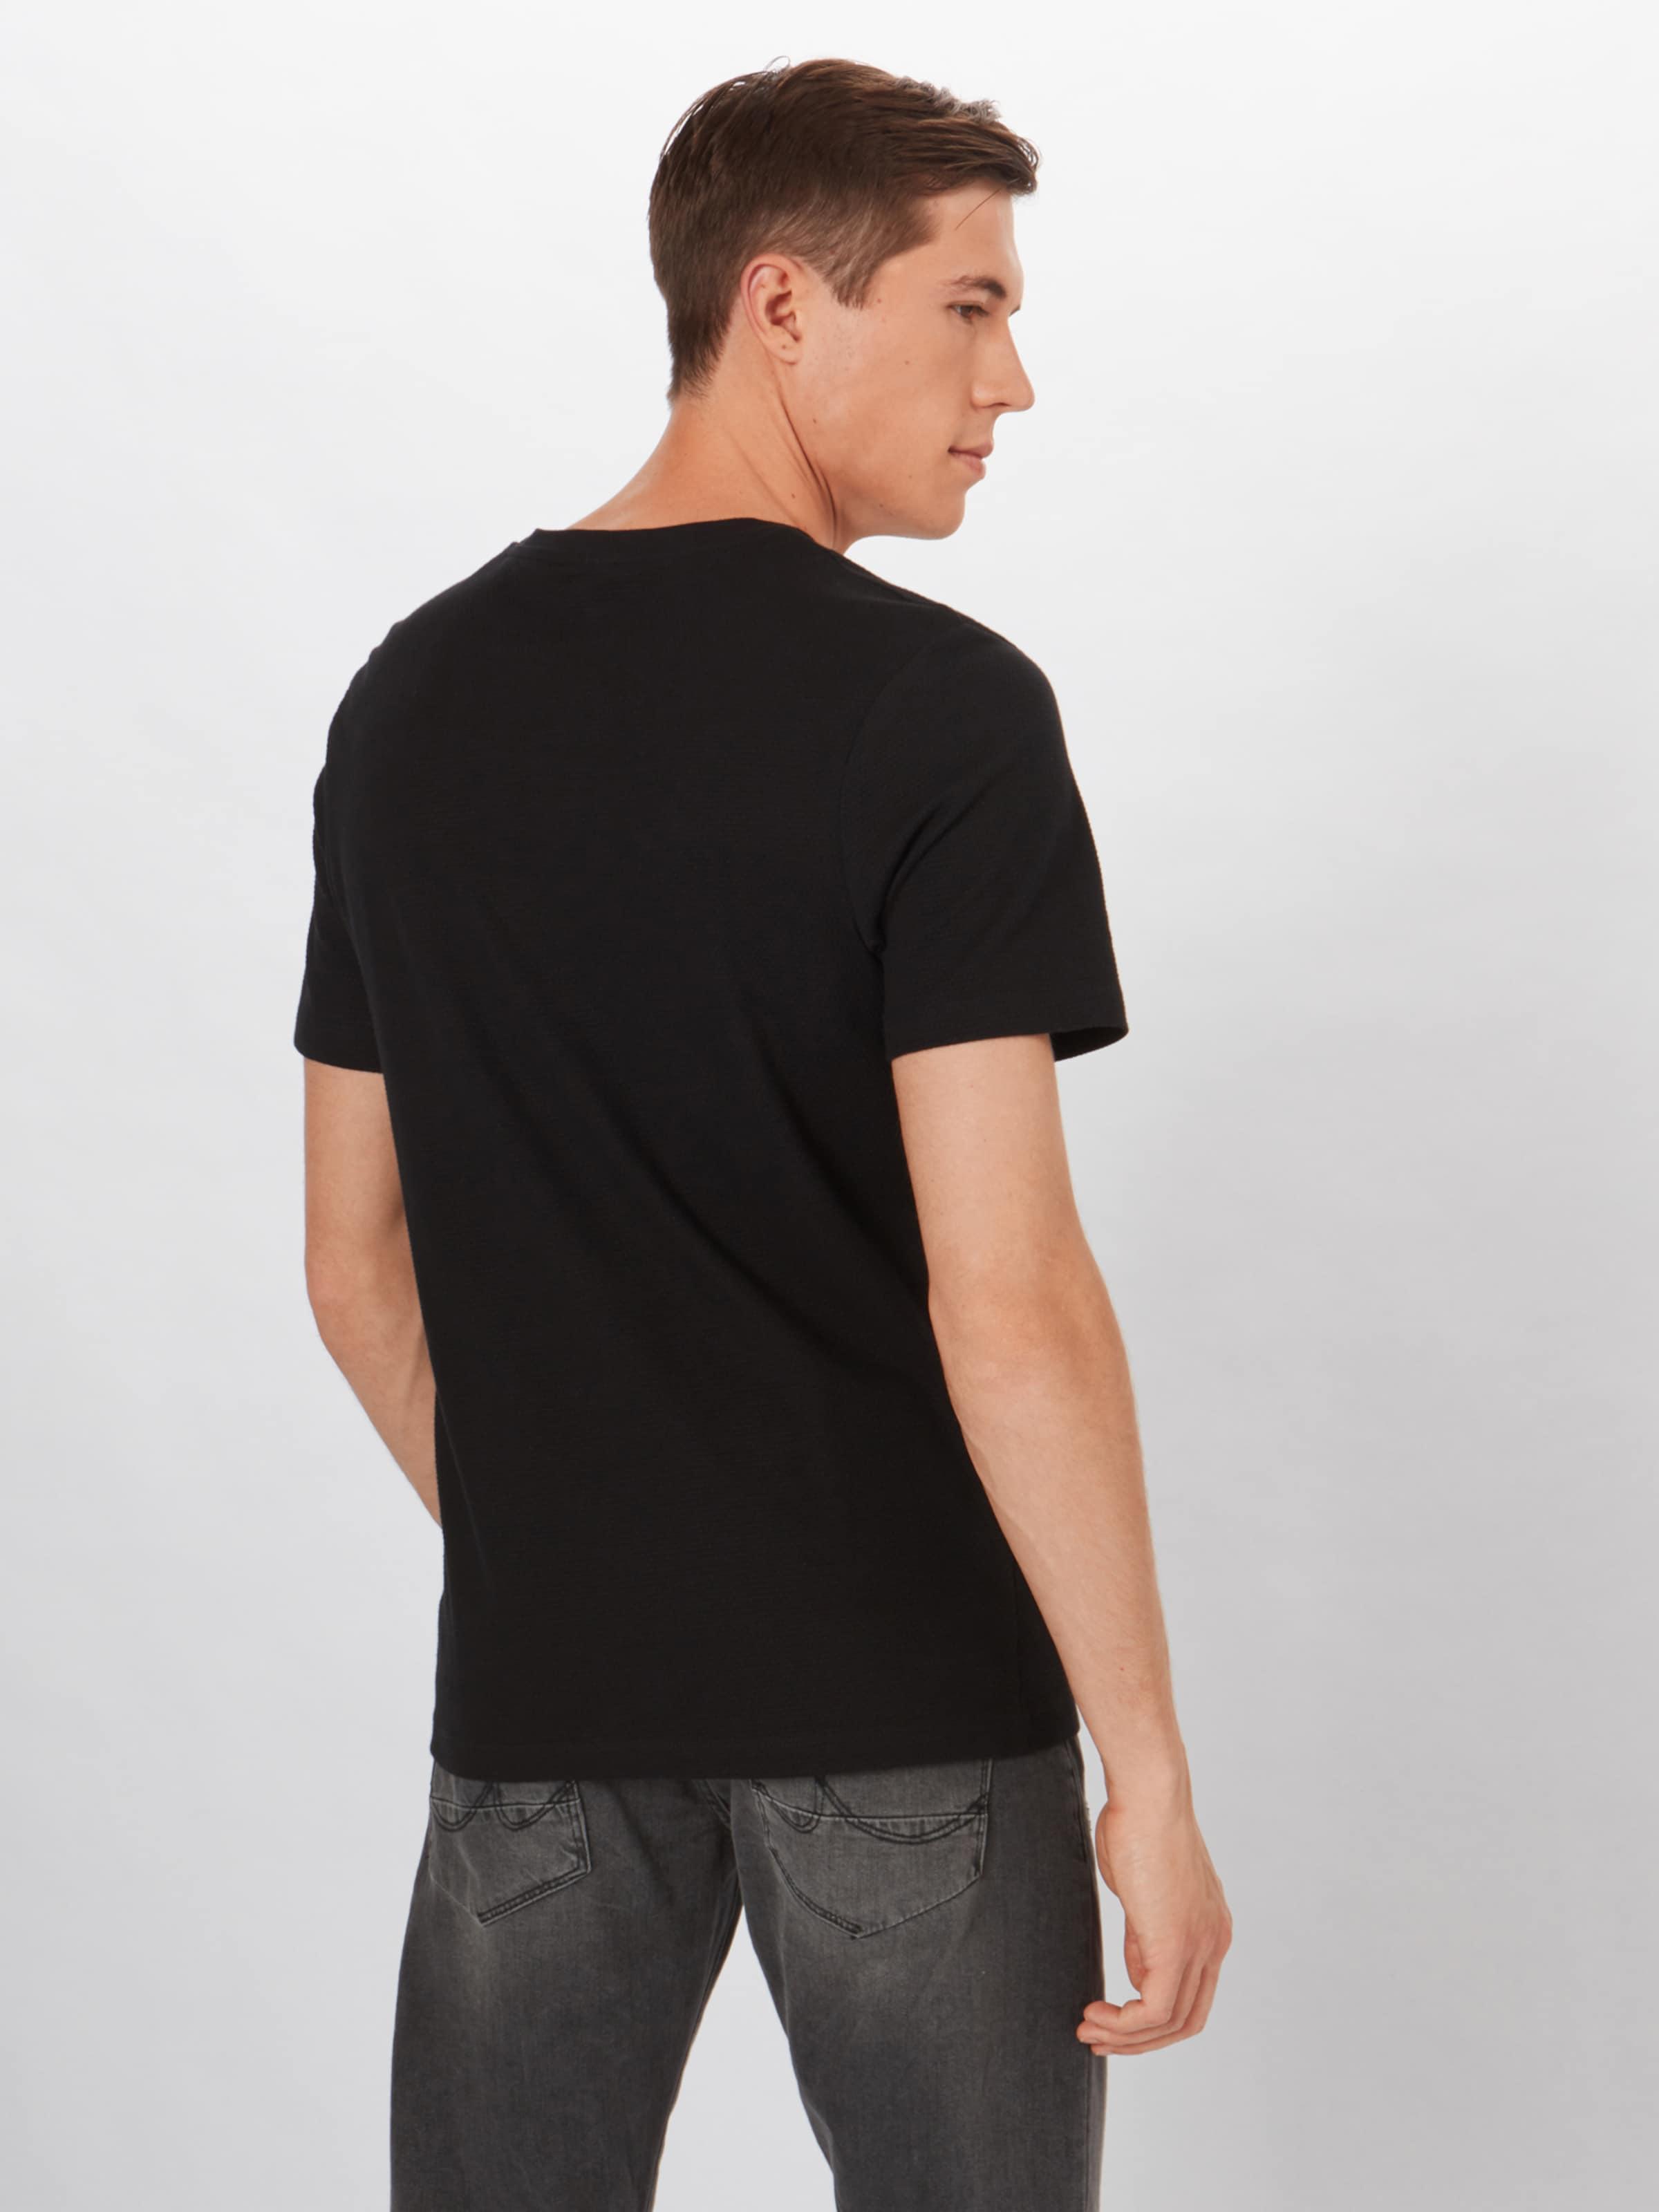 Jones 'like' En Jackamp; Noir T shirt 1cFJuTl3K